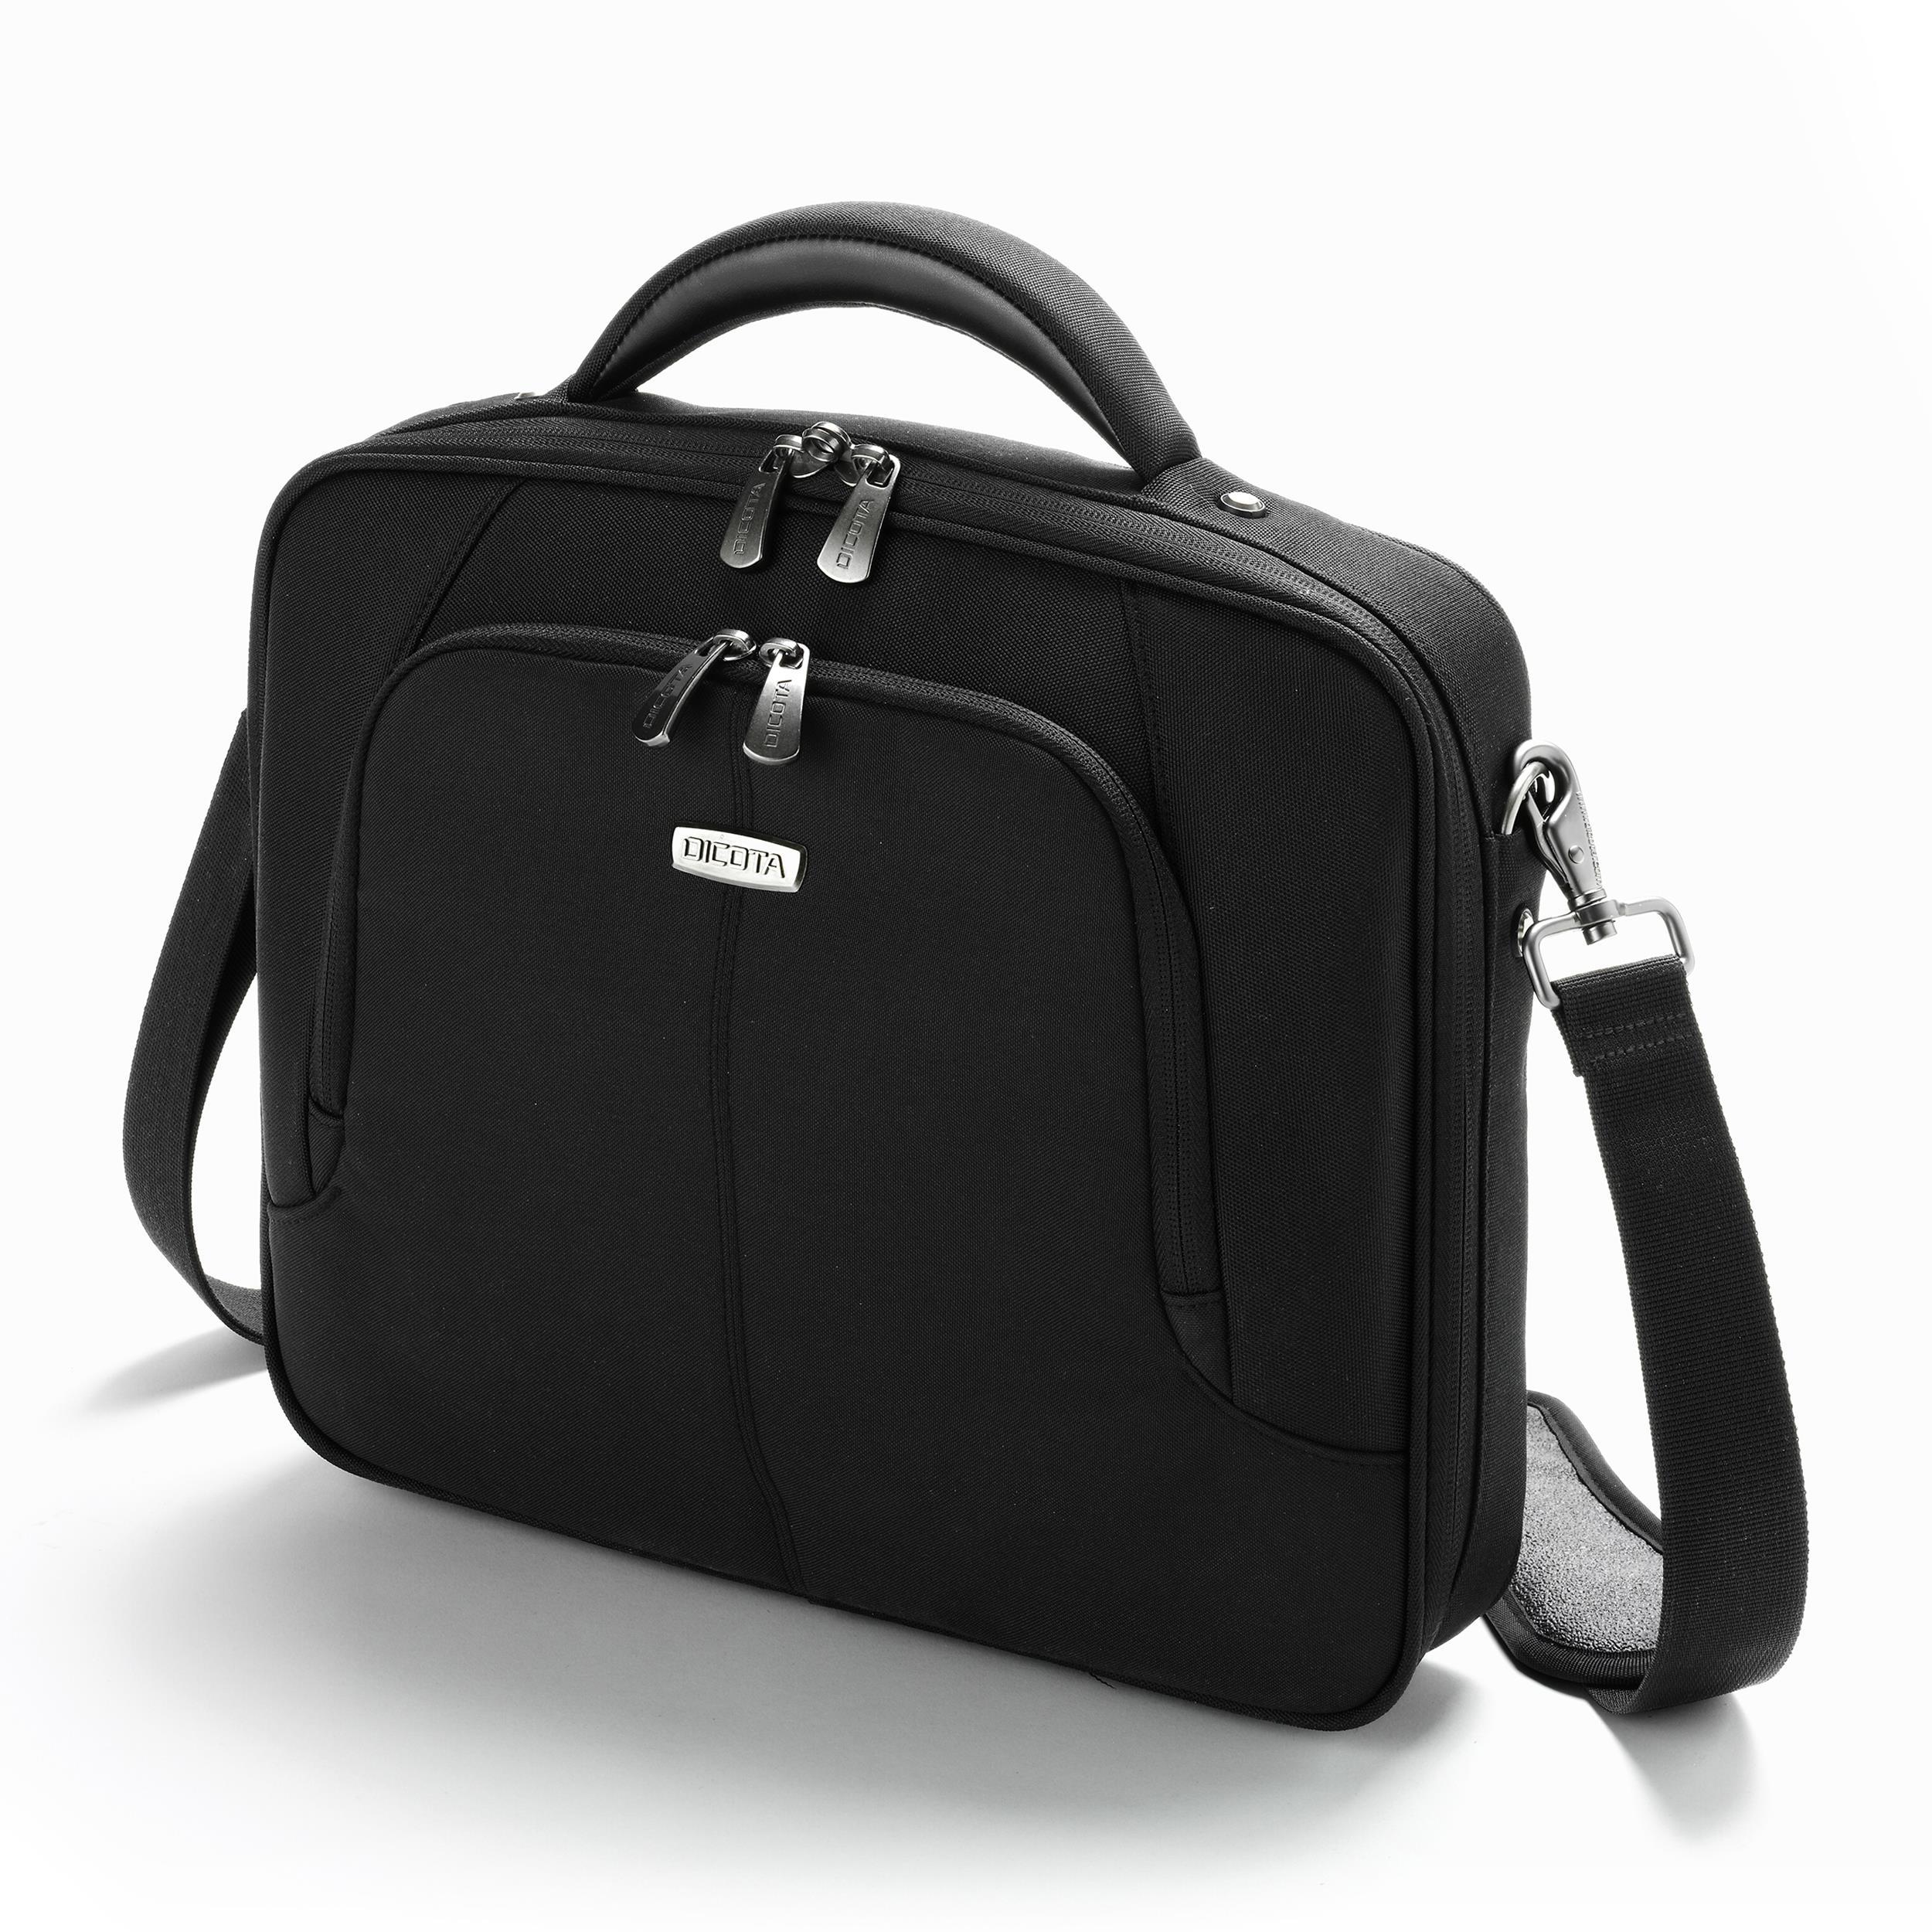 NOTEBOOK BAG DICOTA MULTI START ORIGINAL  15.0 UP TO 15.6 - BLACK قماش CLOTH ,Laptop Bag